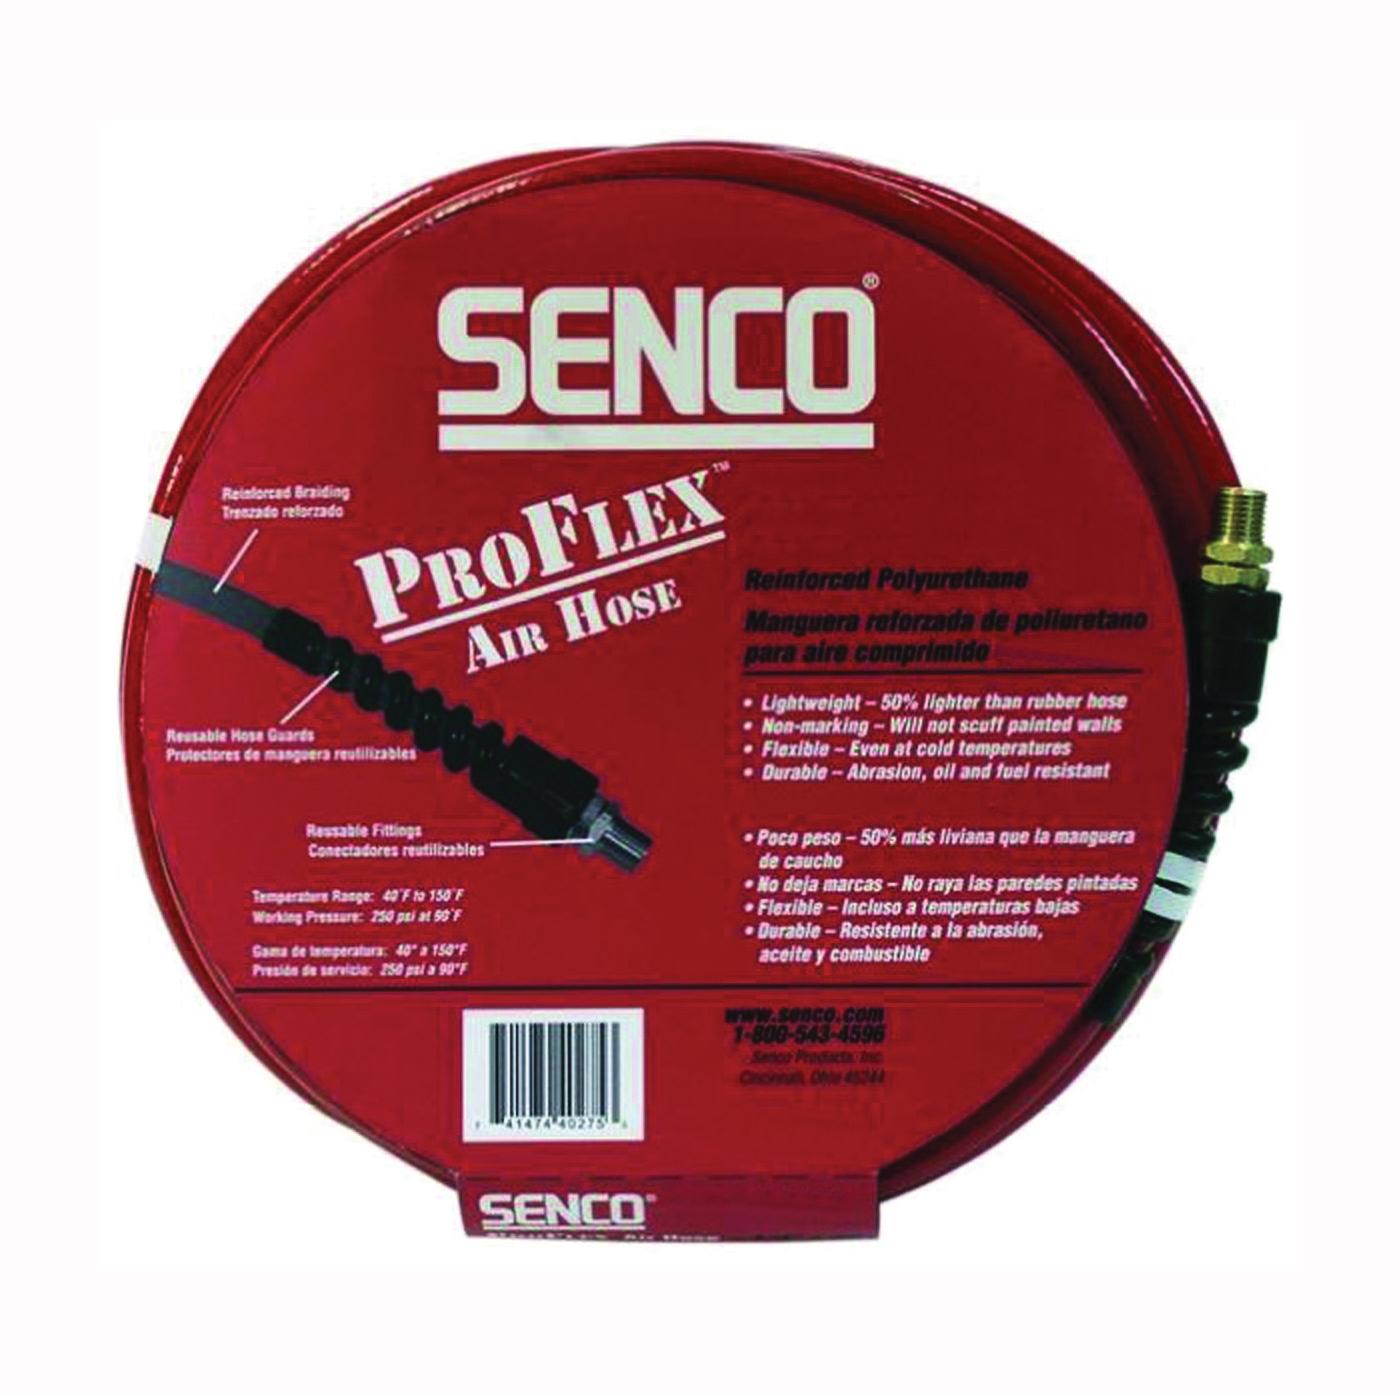 Picture of SENCO PC0979 Air Hose, 3/8 in OD, 50 ft L, MPT, 250 psi Pressure, Polyurethane